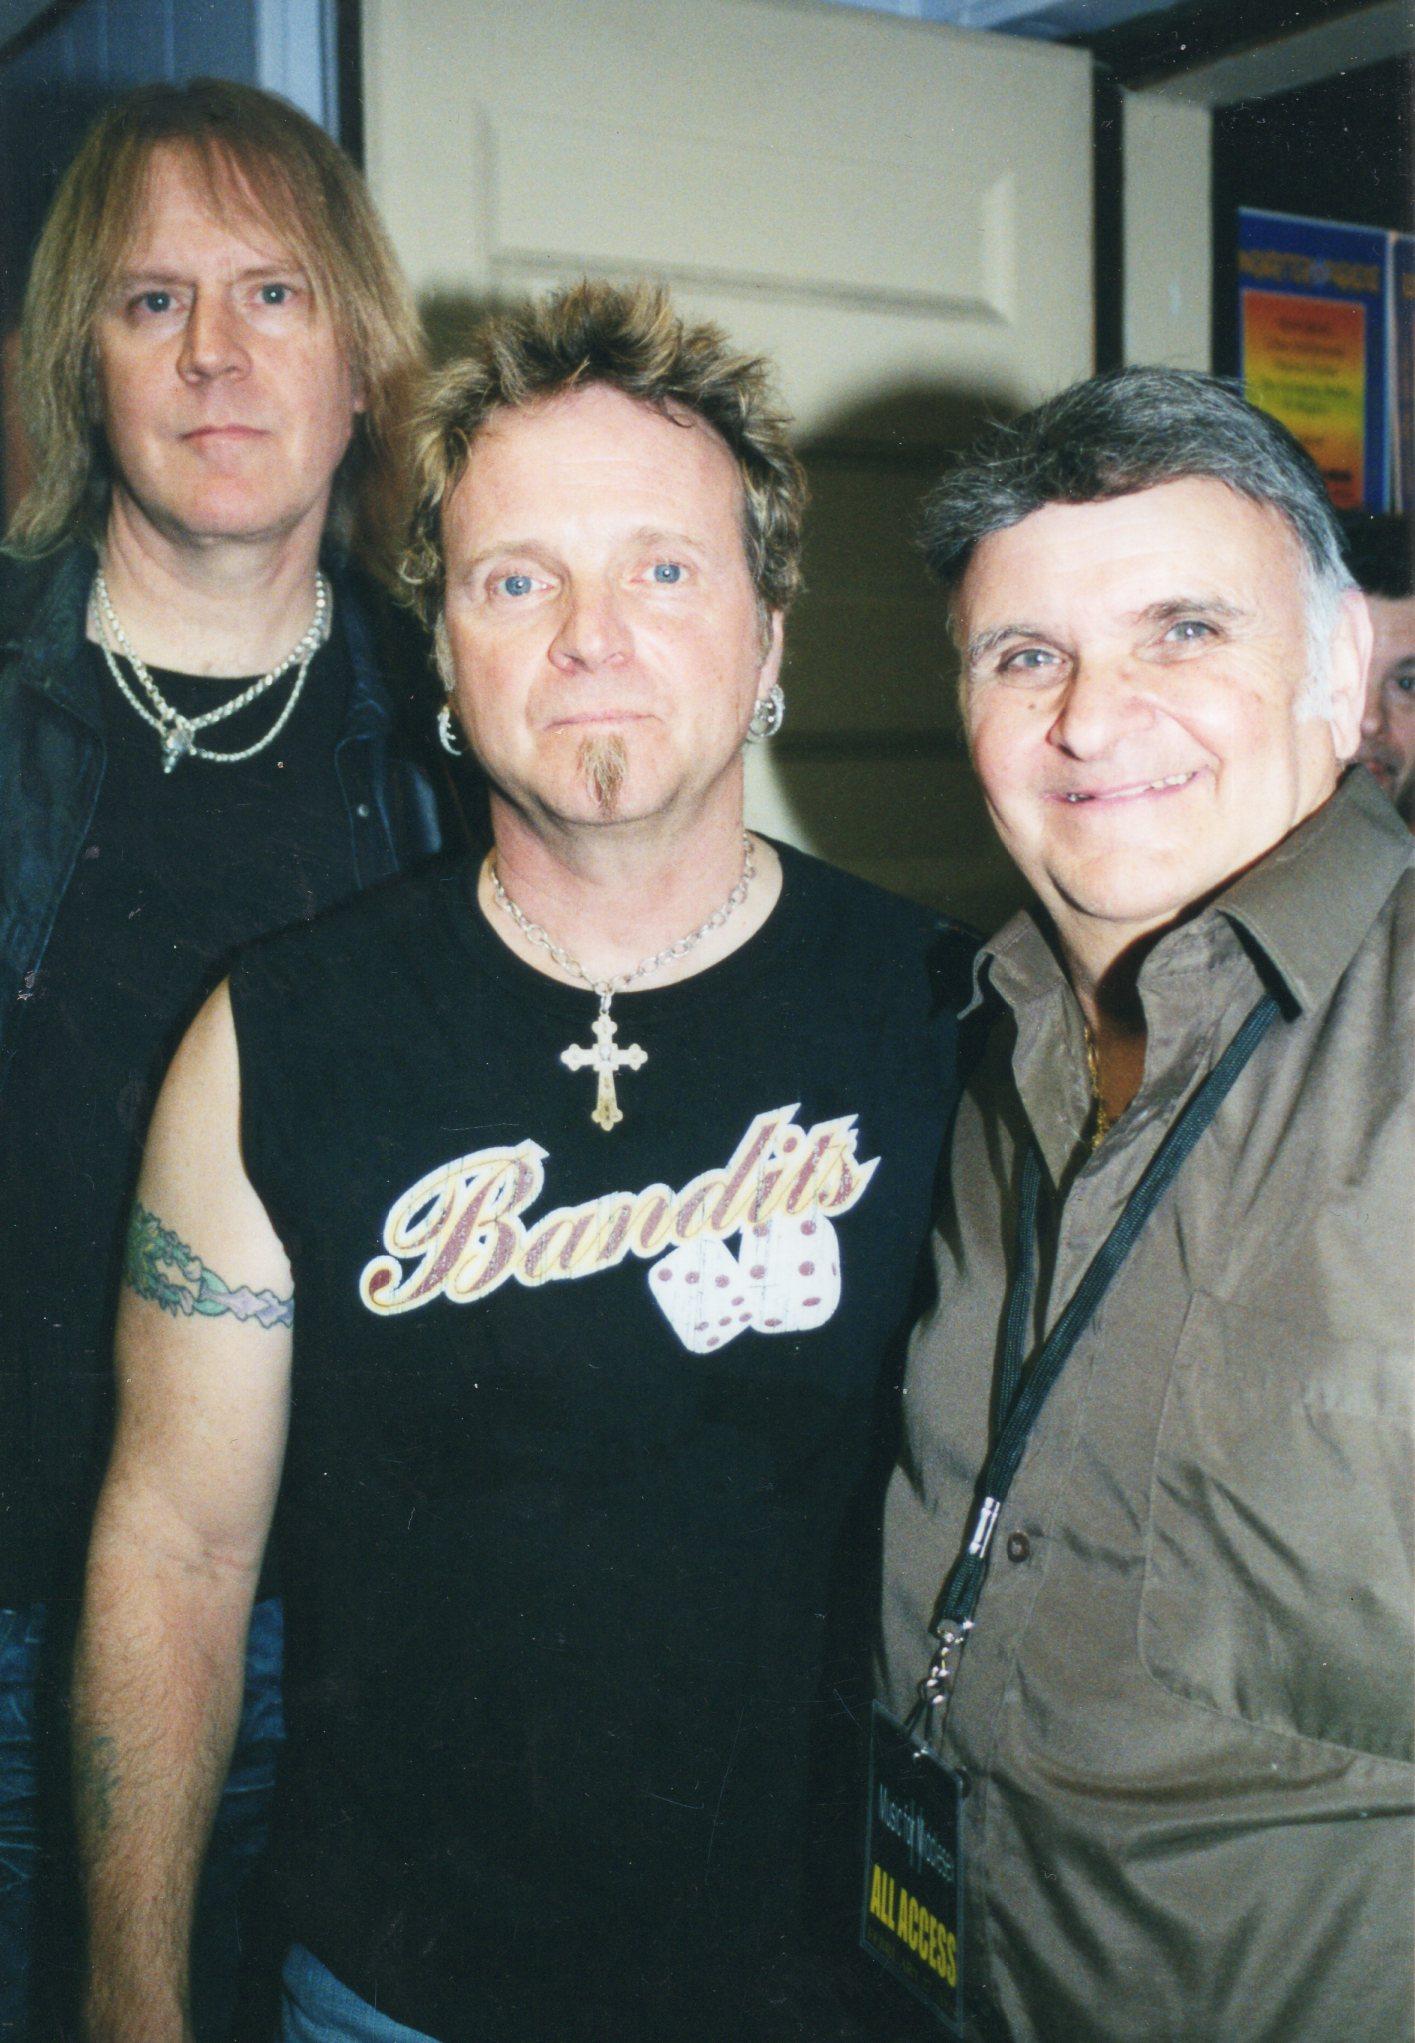 Tom Hamilton & Joey Kramer (Aerosmith)